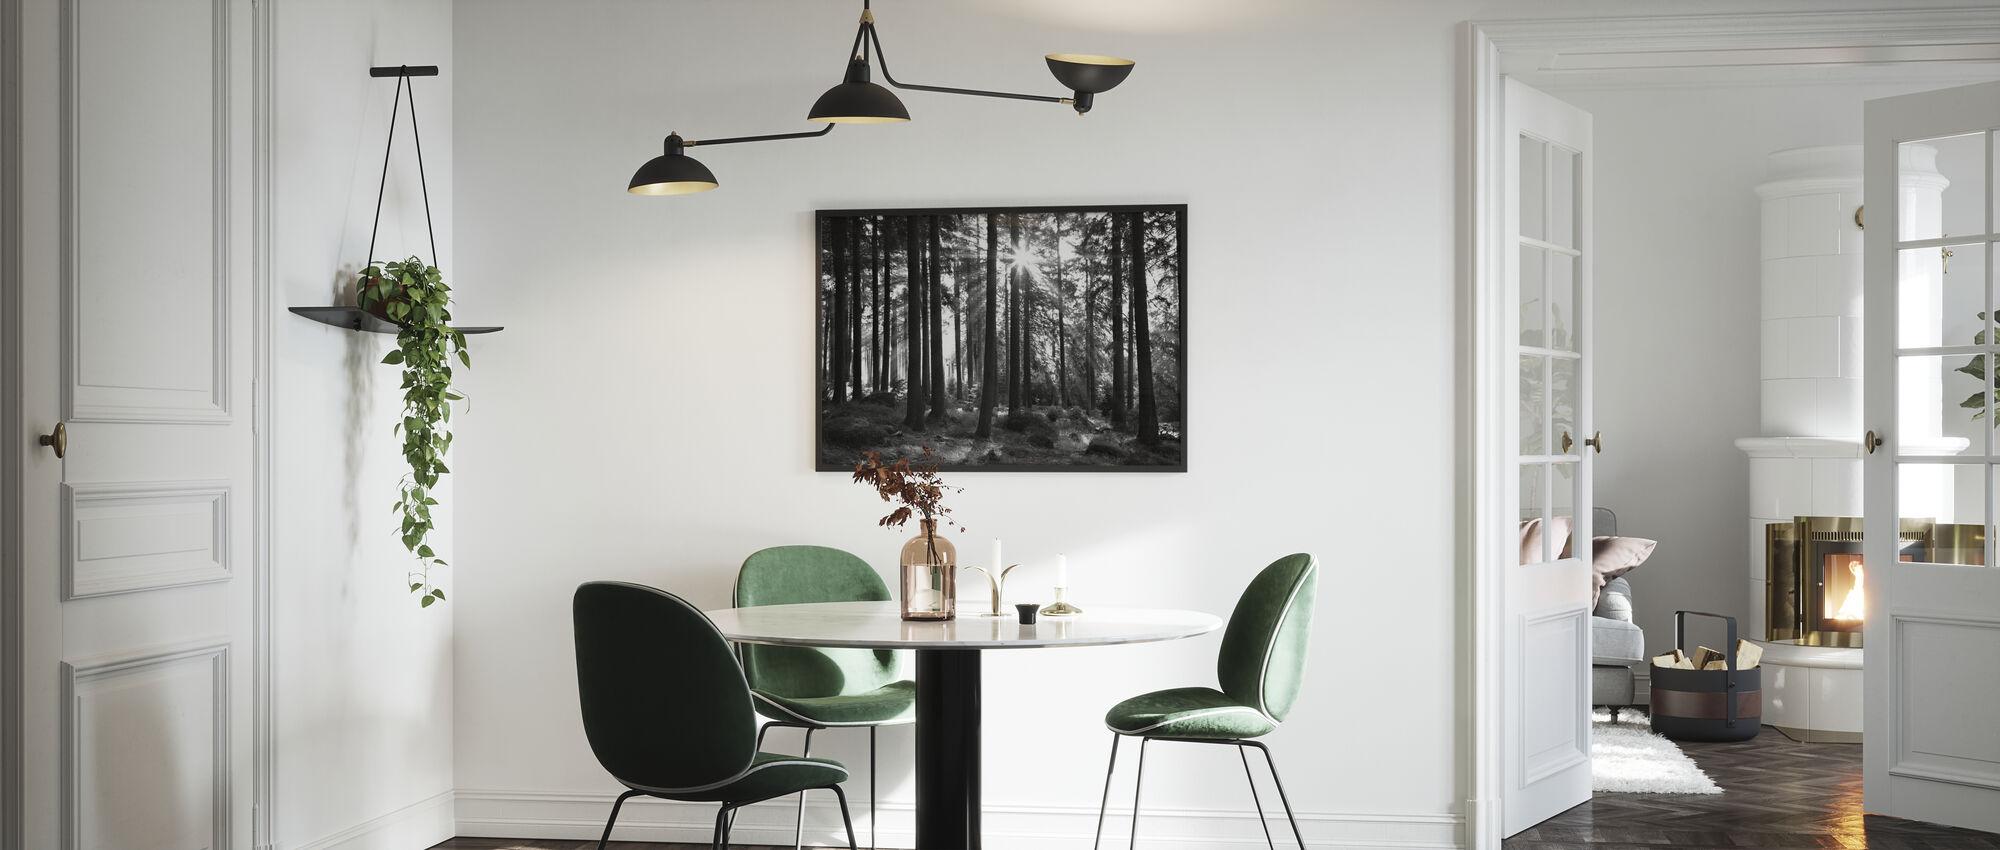 Auringonsäde puiden läpi - Juliste - Keittiö